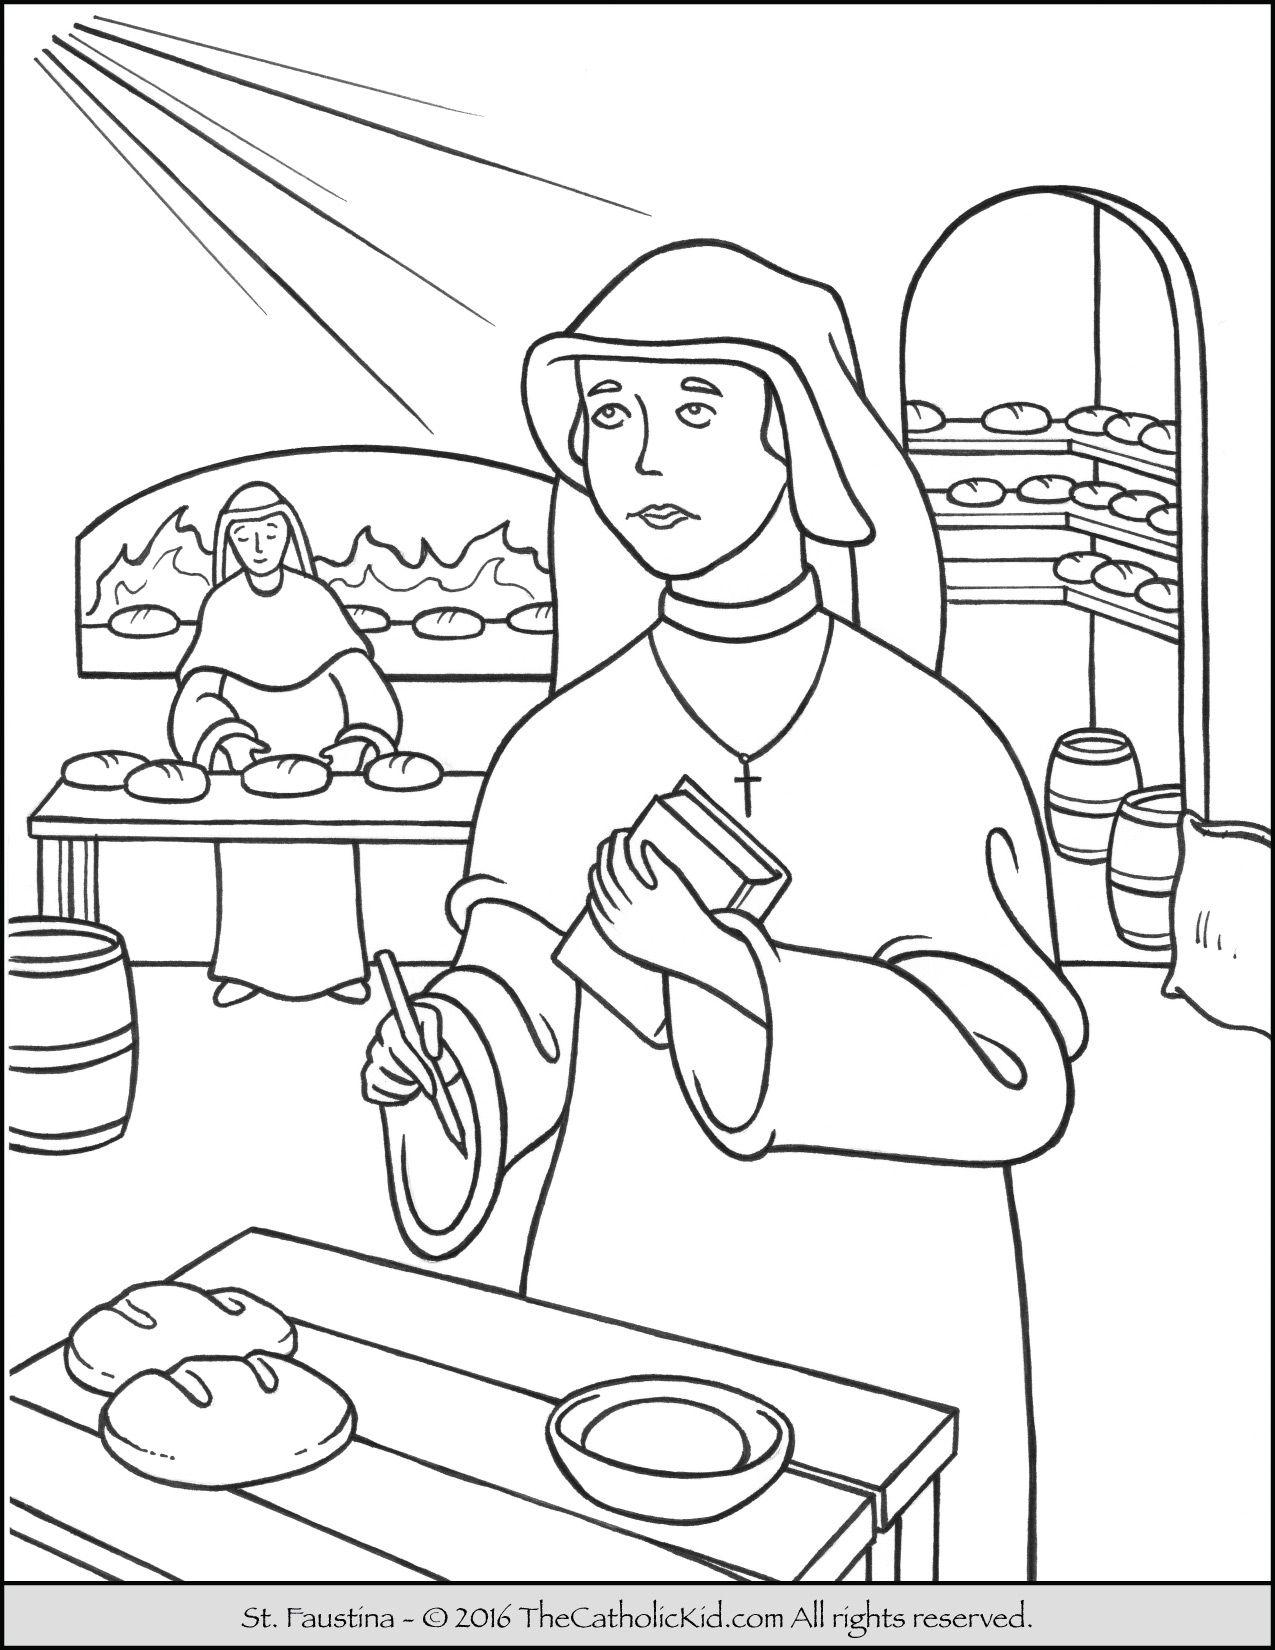 Saint Faustina Coloring Page The Catholic Kid Catholic